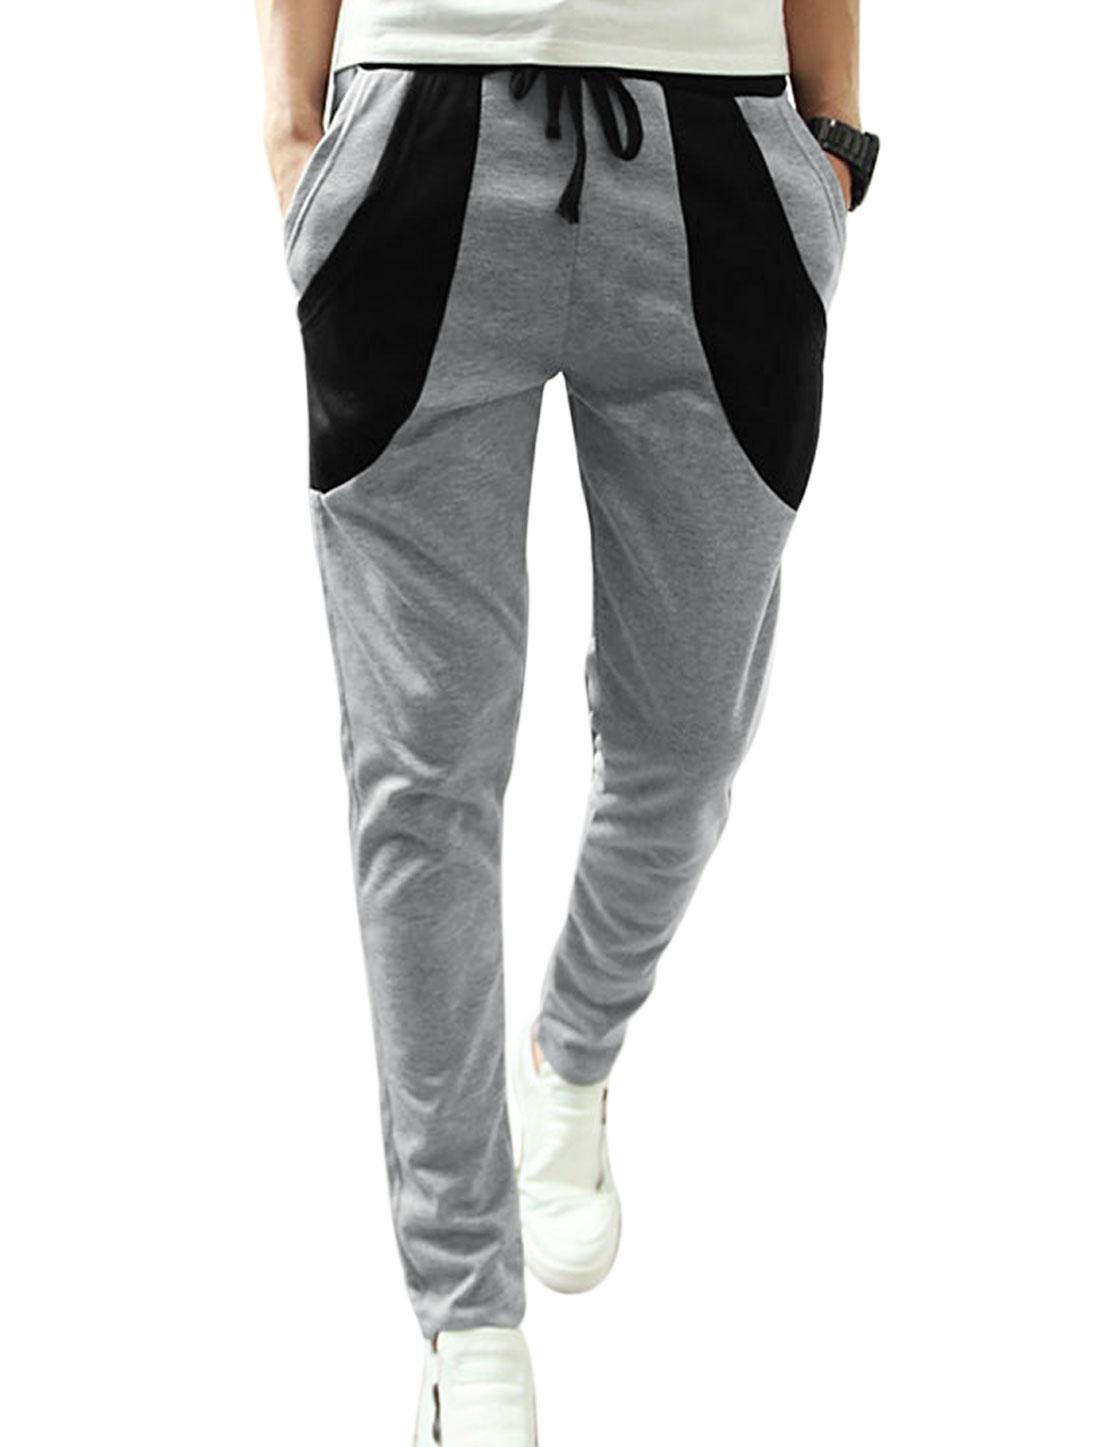 Men Drawstring Waist Two Slant Pockets Panel Casual Pants Light Gray W30